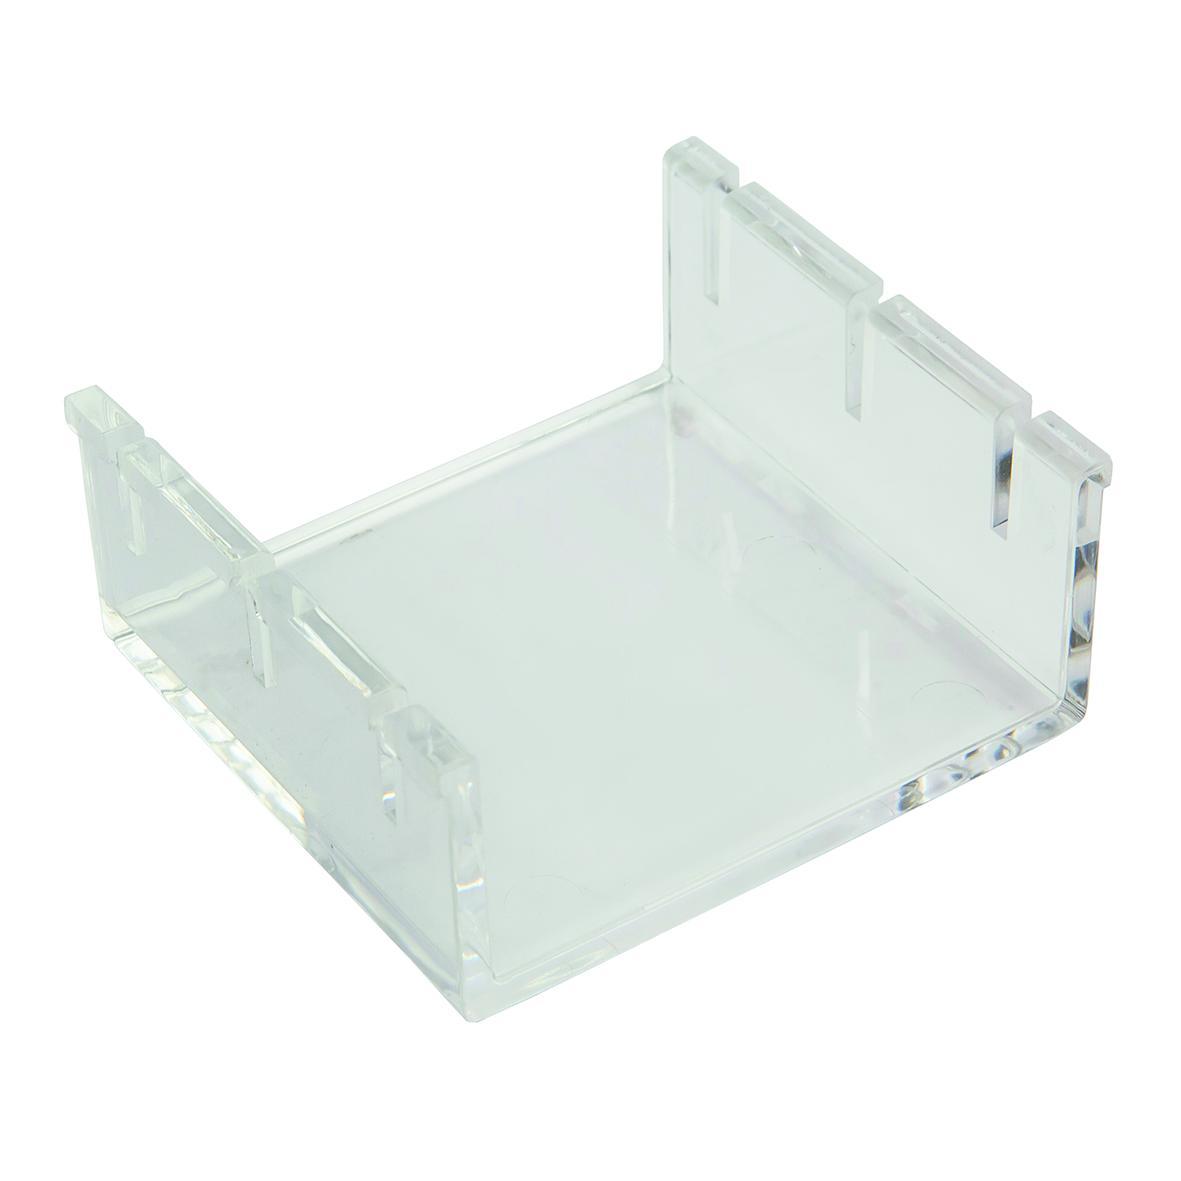 Mini tray, 70x70mm voor Elektroforesekamer (LLG6234434)